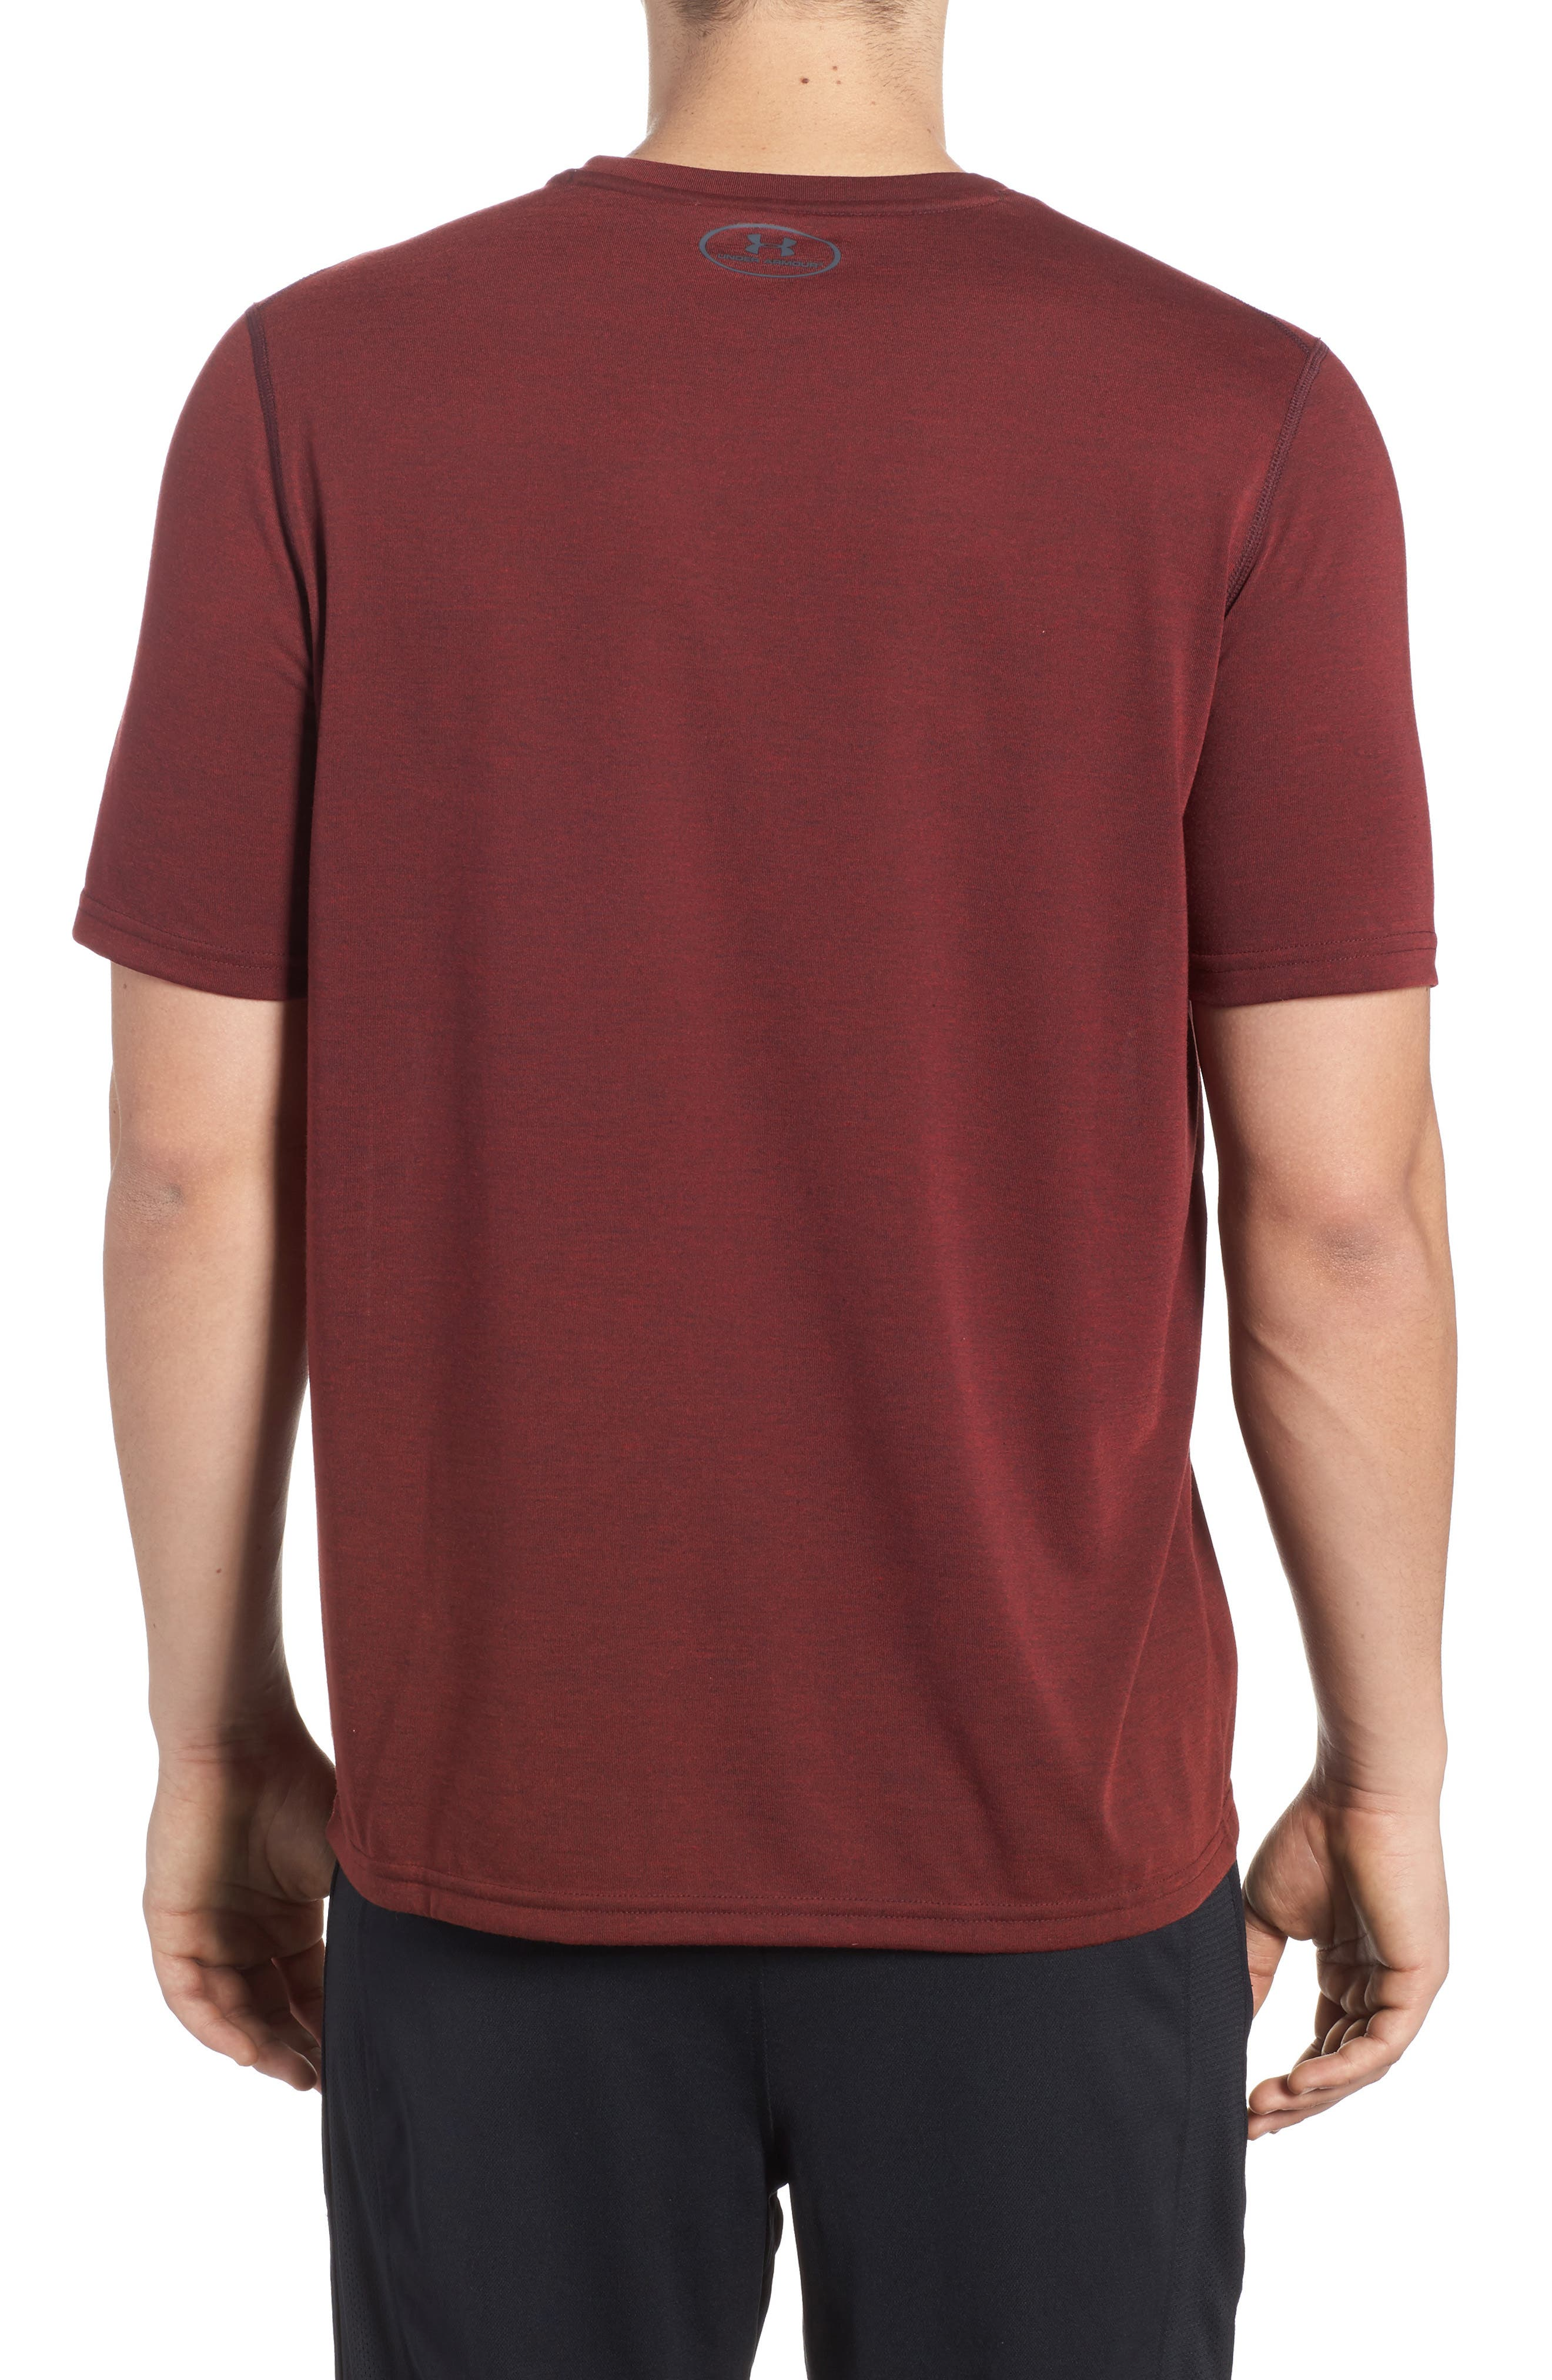 Alternate Image 2  - Under Armour Threadborne Siro 3C Twist T-Shirt